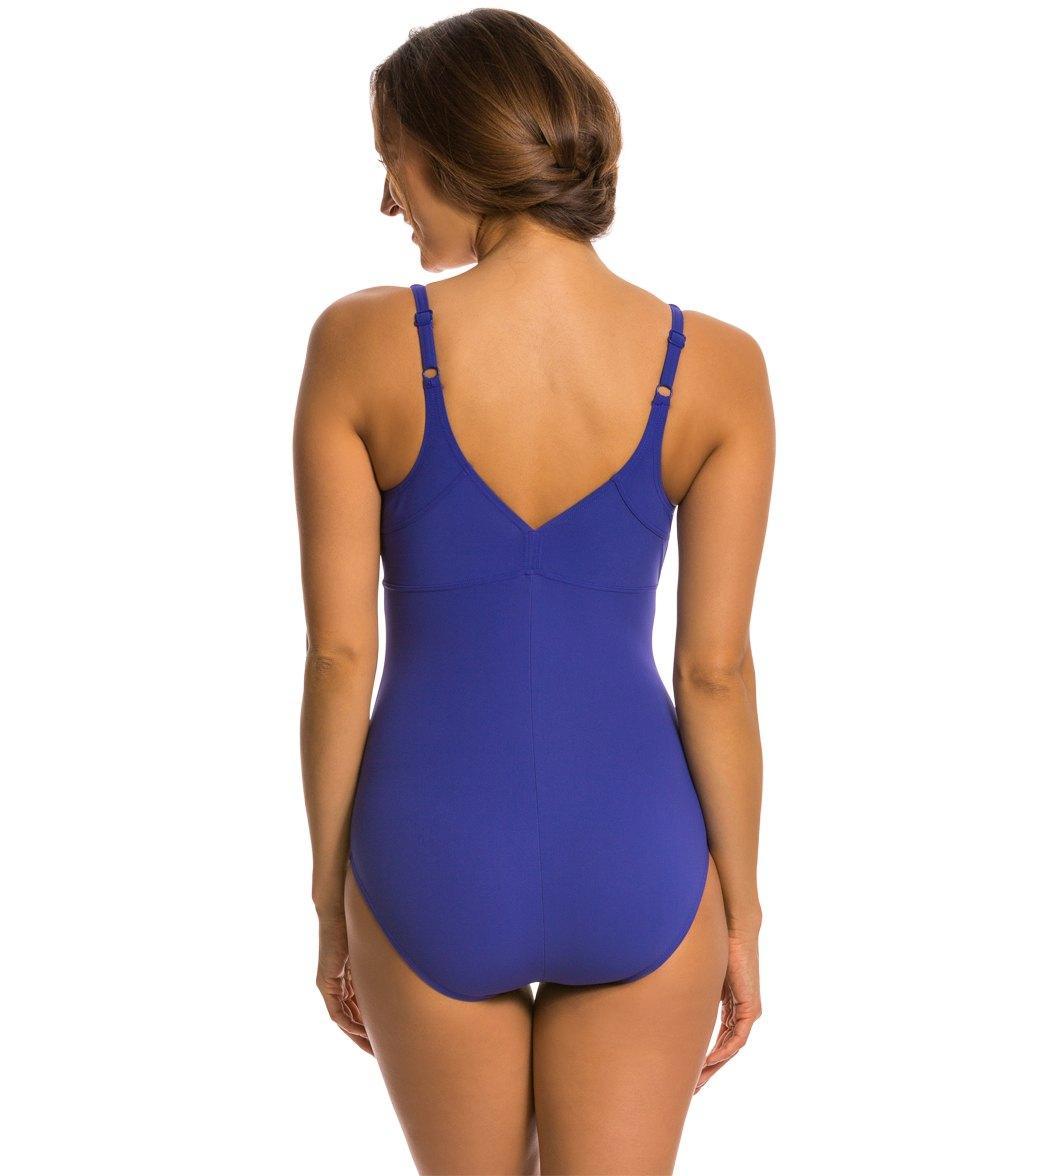 1809204297bb9 Arena Aquafit Mowgli Low One Piece Swimsuit at SwimOutlet.com - Free ...